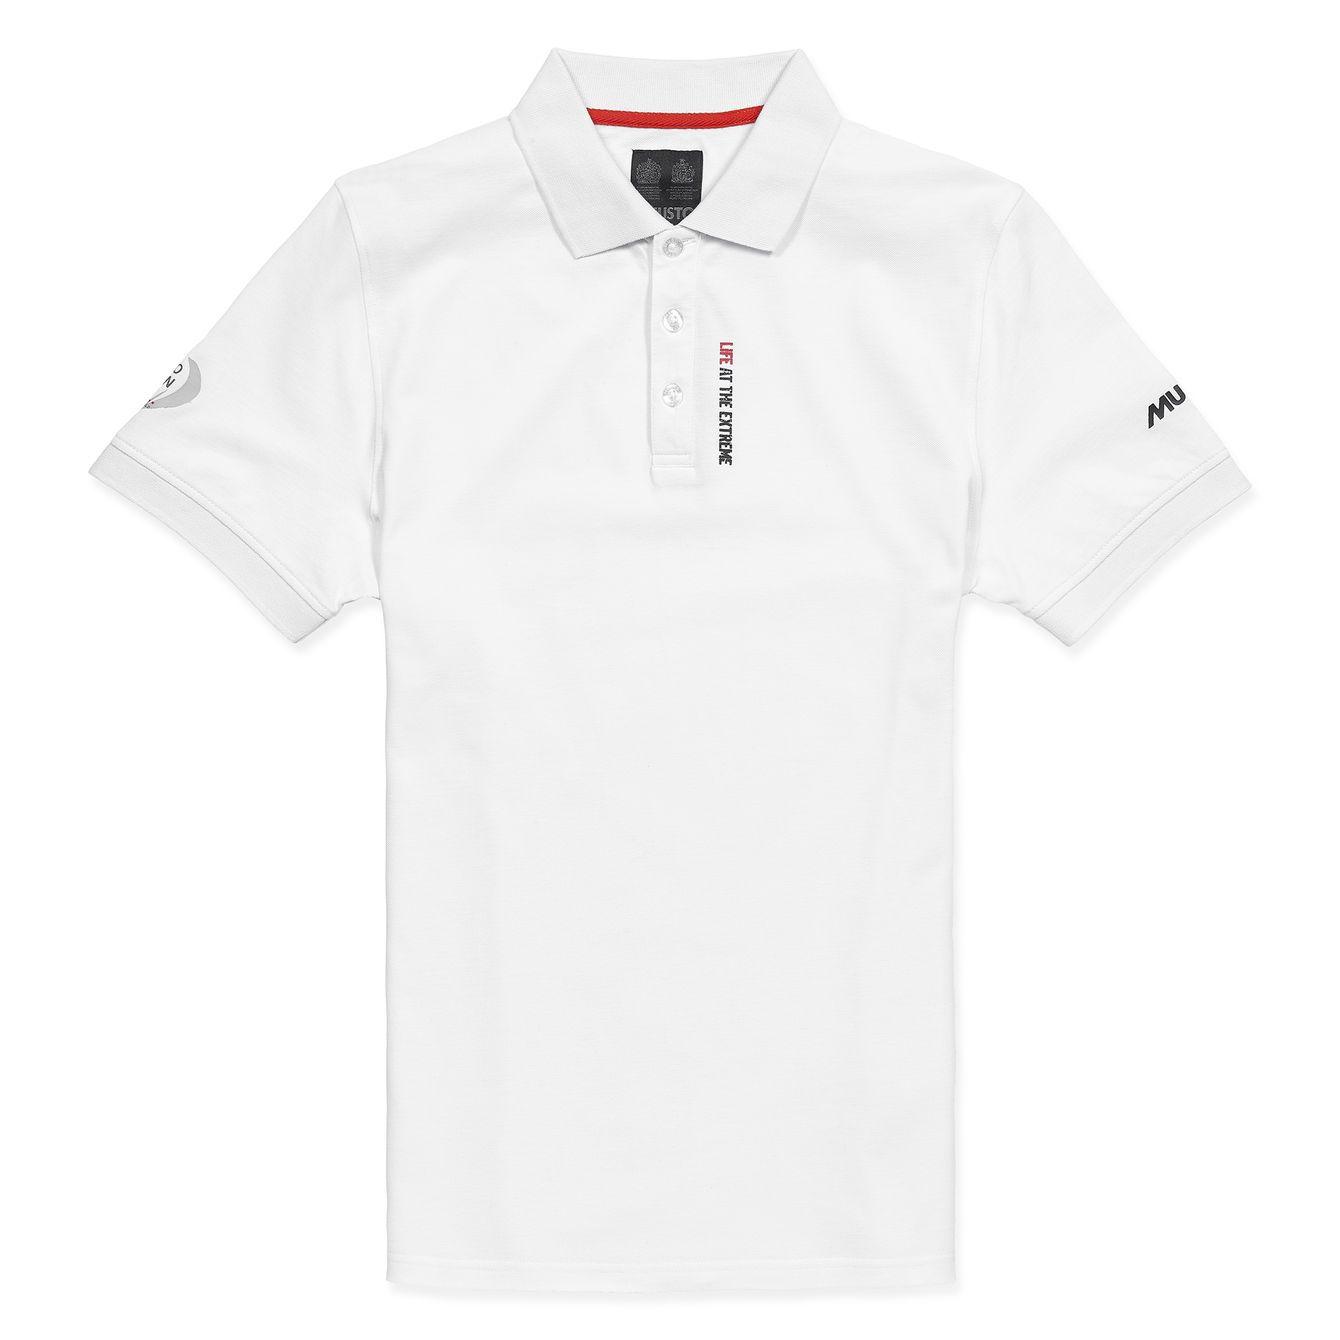 Hugo Boss Green Maniche corte Men/'s Polo T-shirt